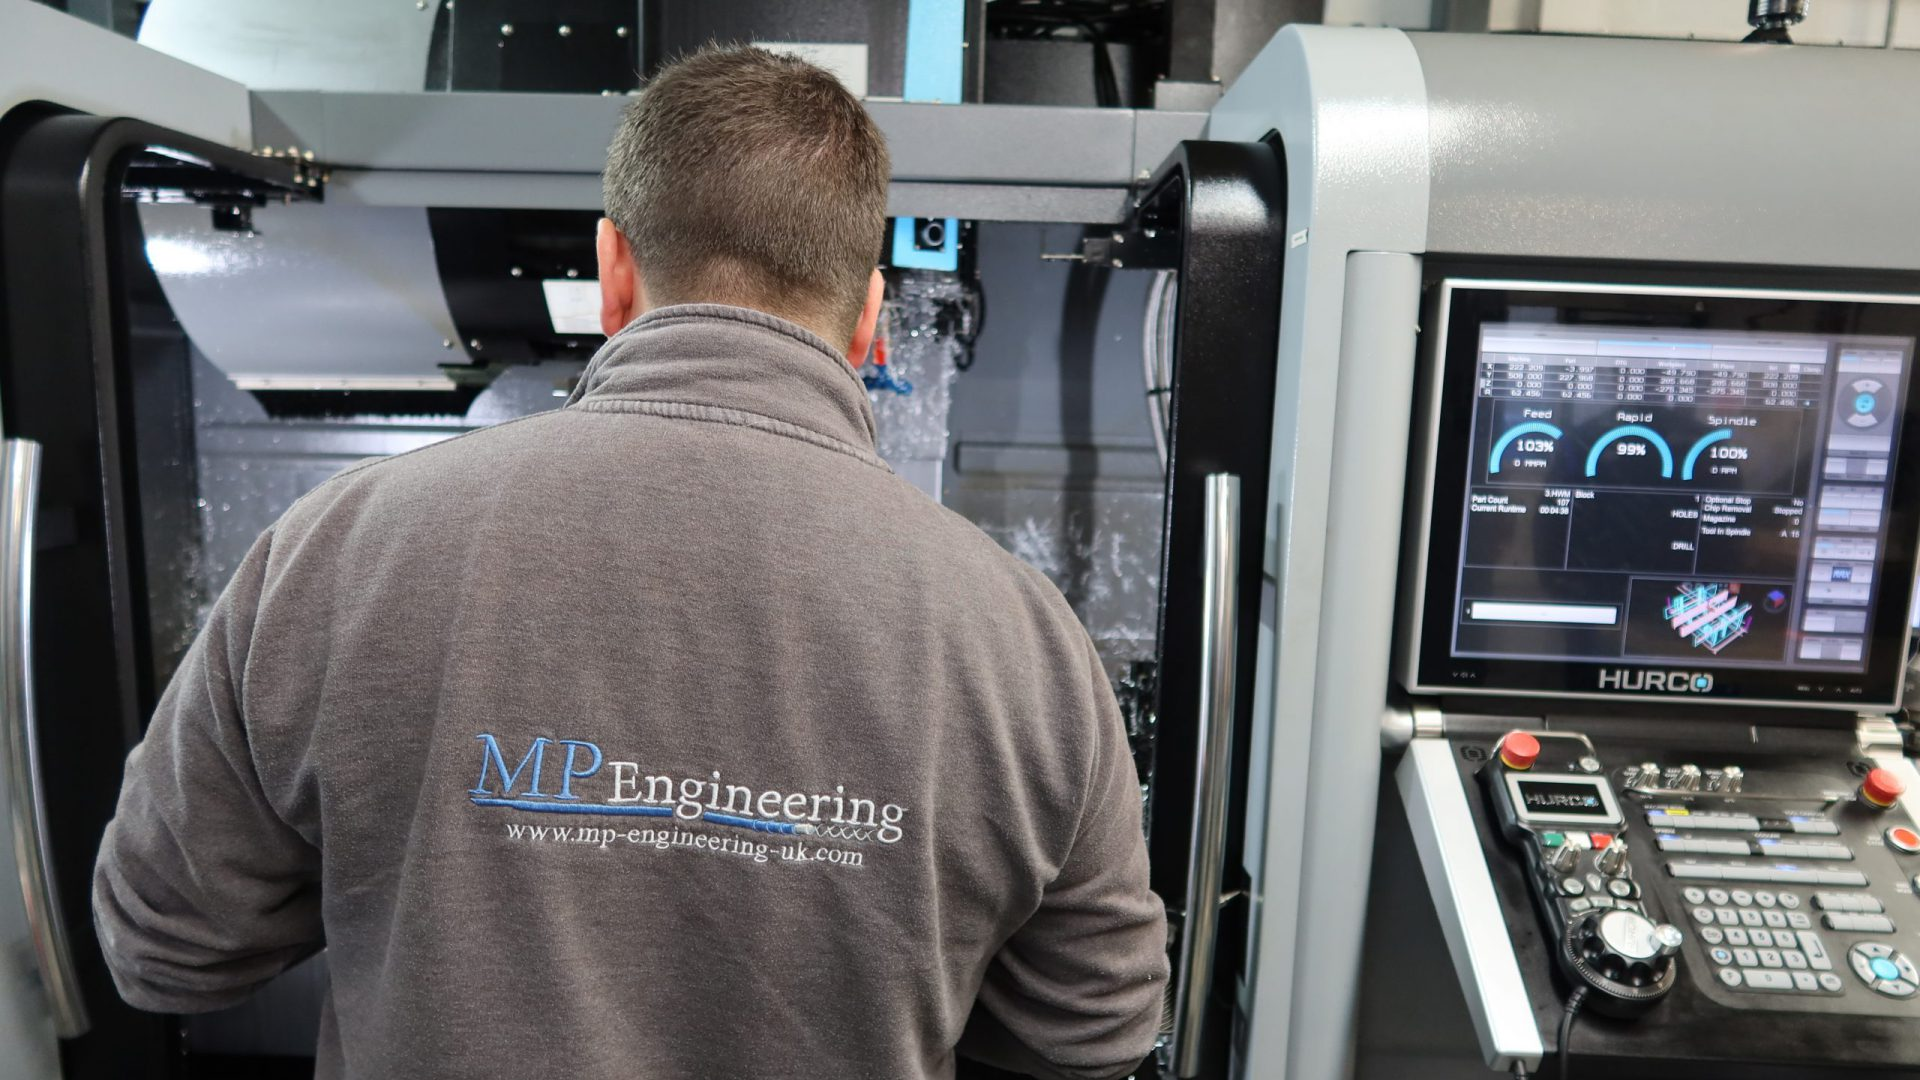 Subcontract Precision Machining Wiltshire